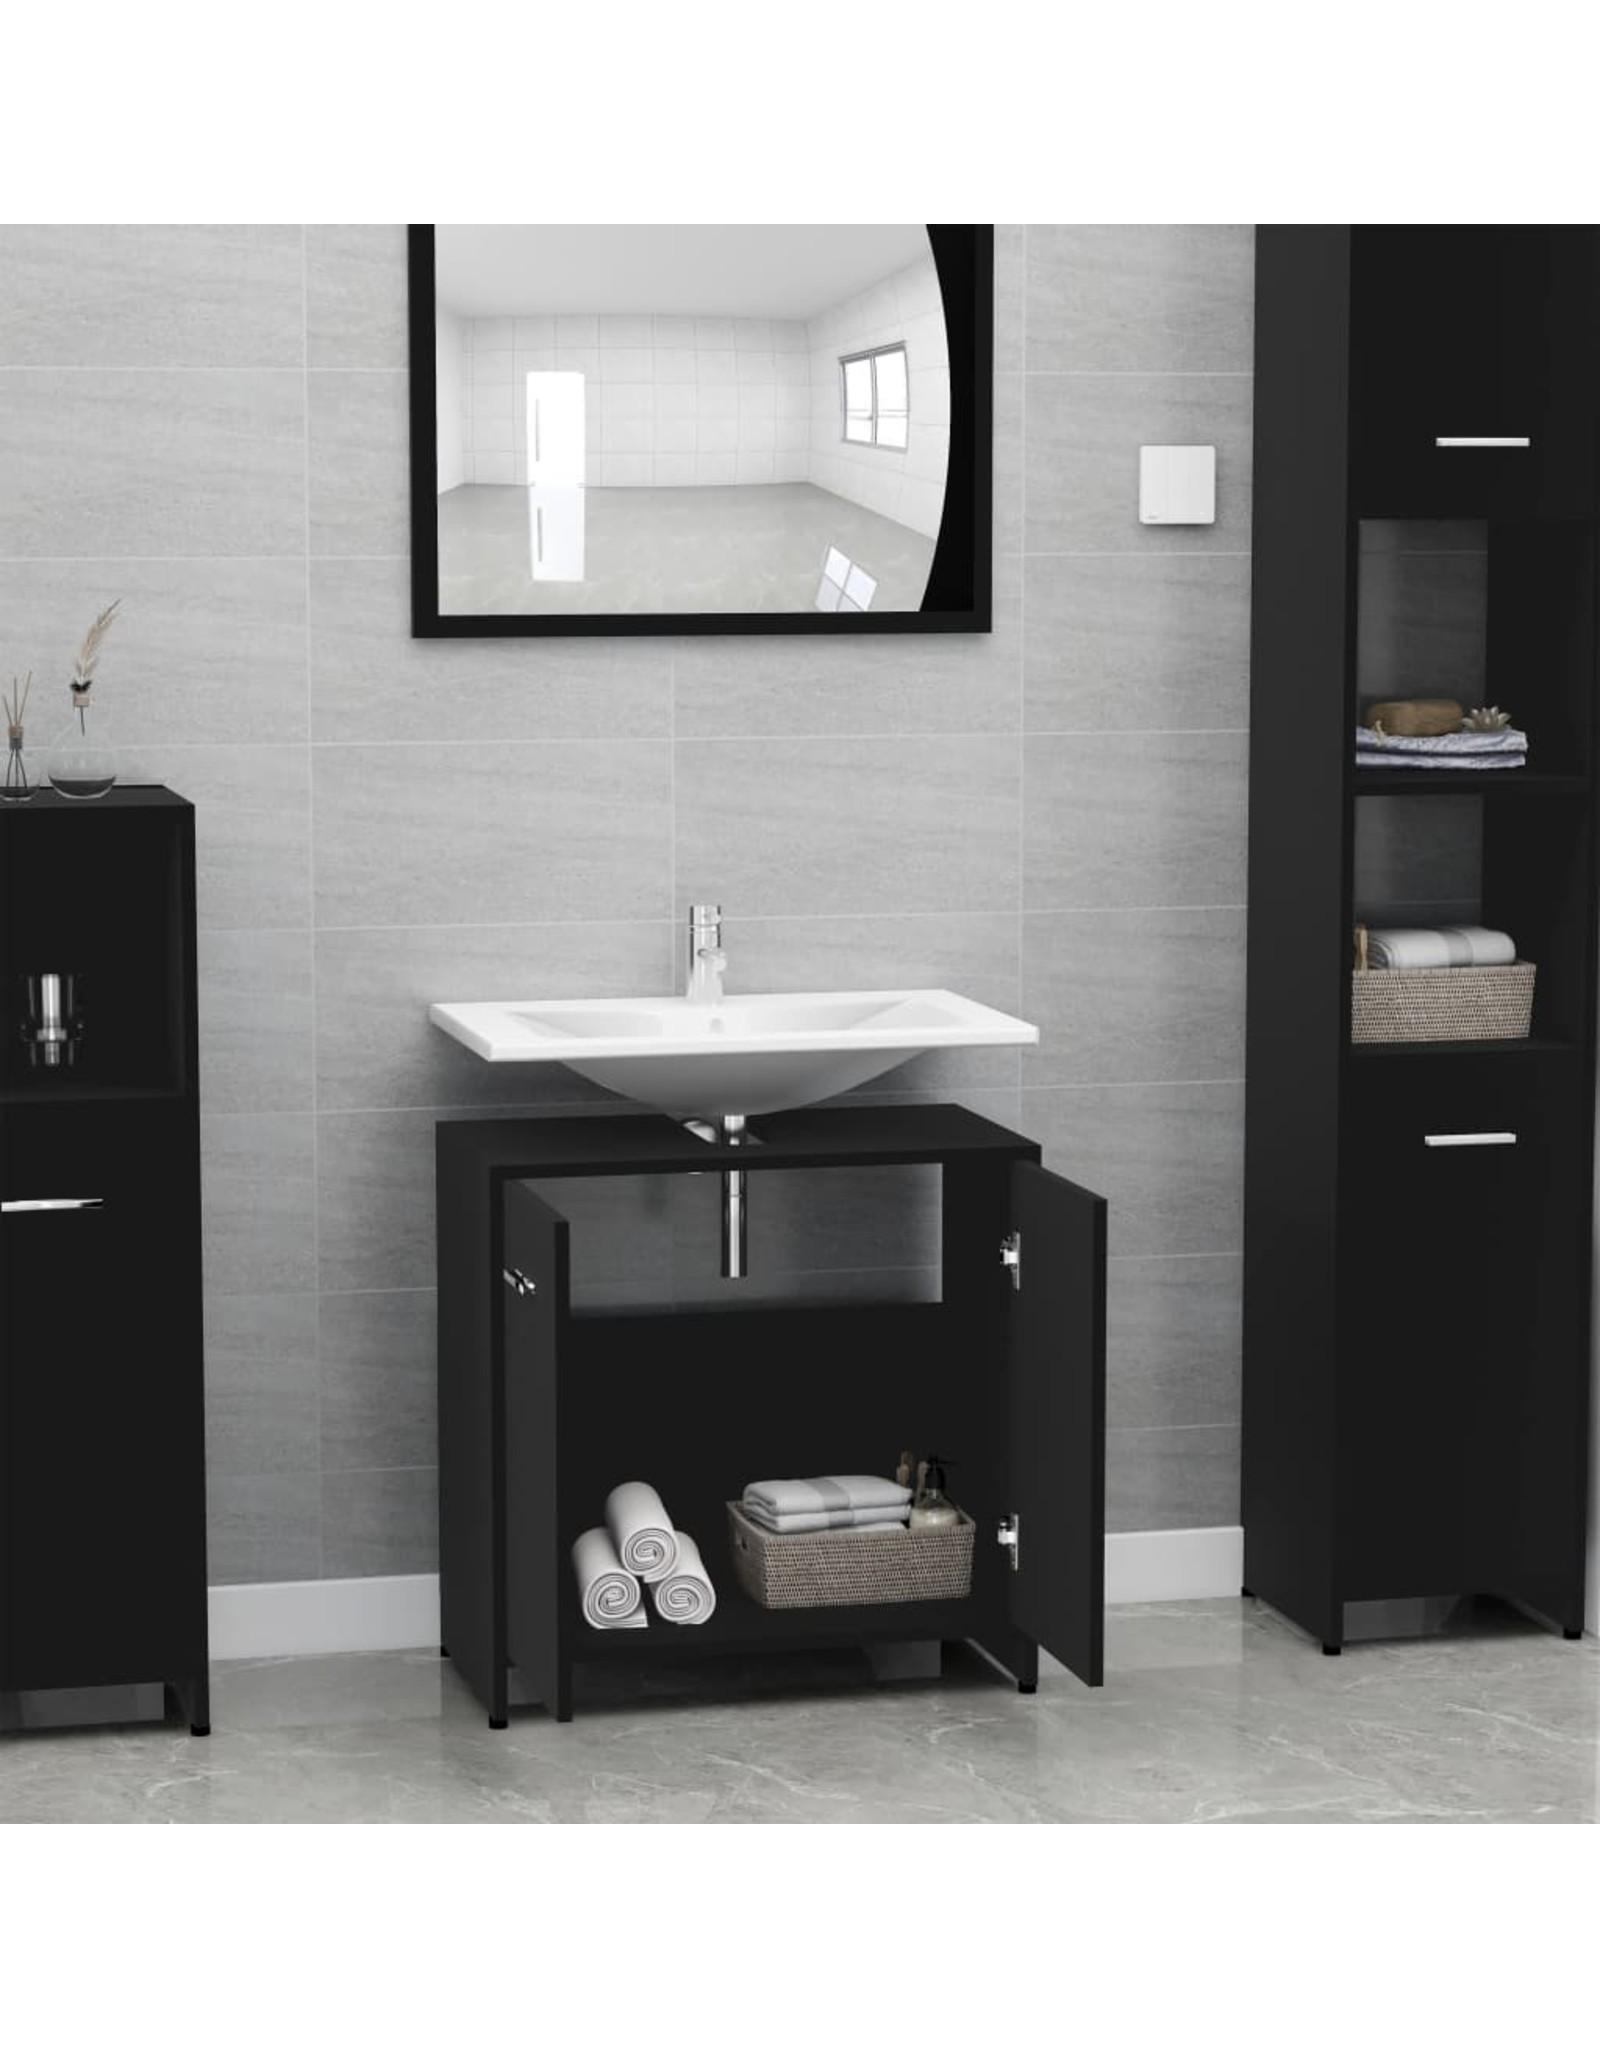 Badkamerkast 60x33x58 cm spaanplaat zwart